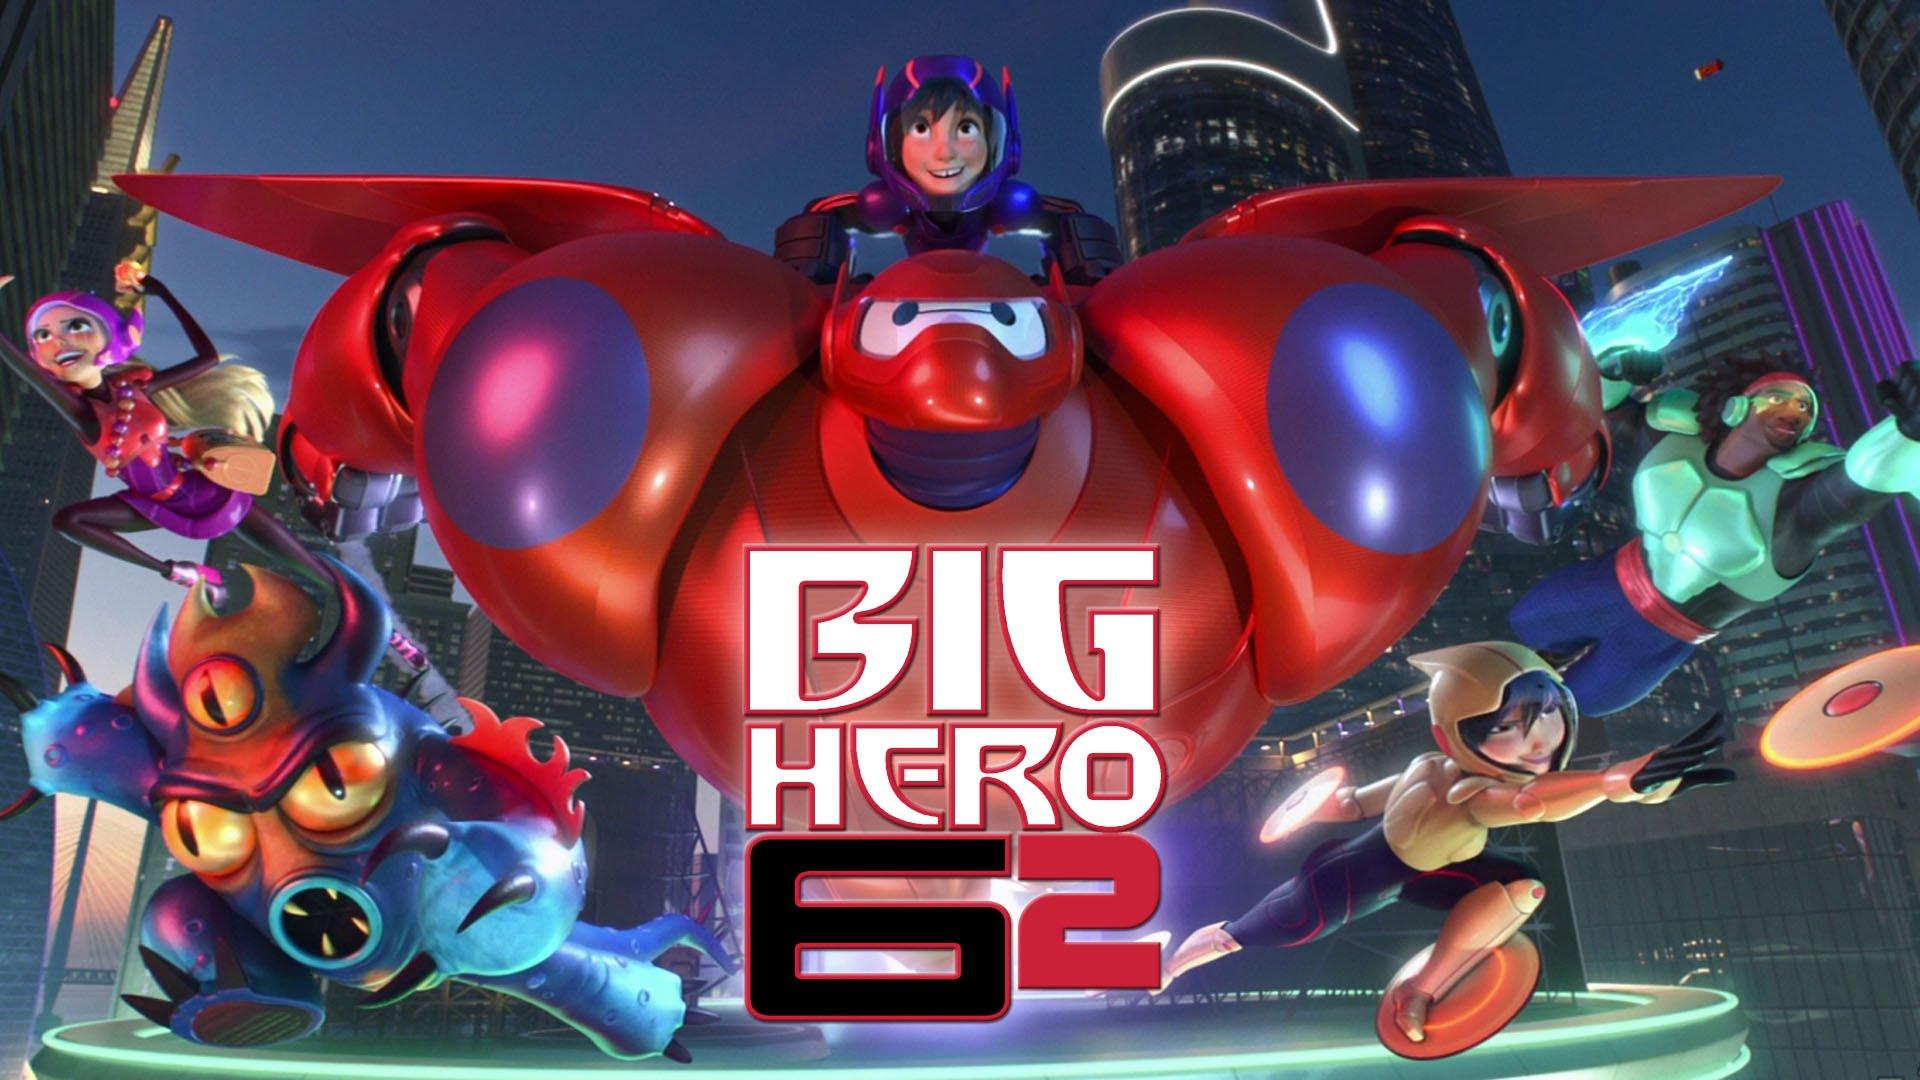 Big Hero 6 Sequel (2018)